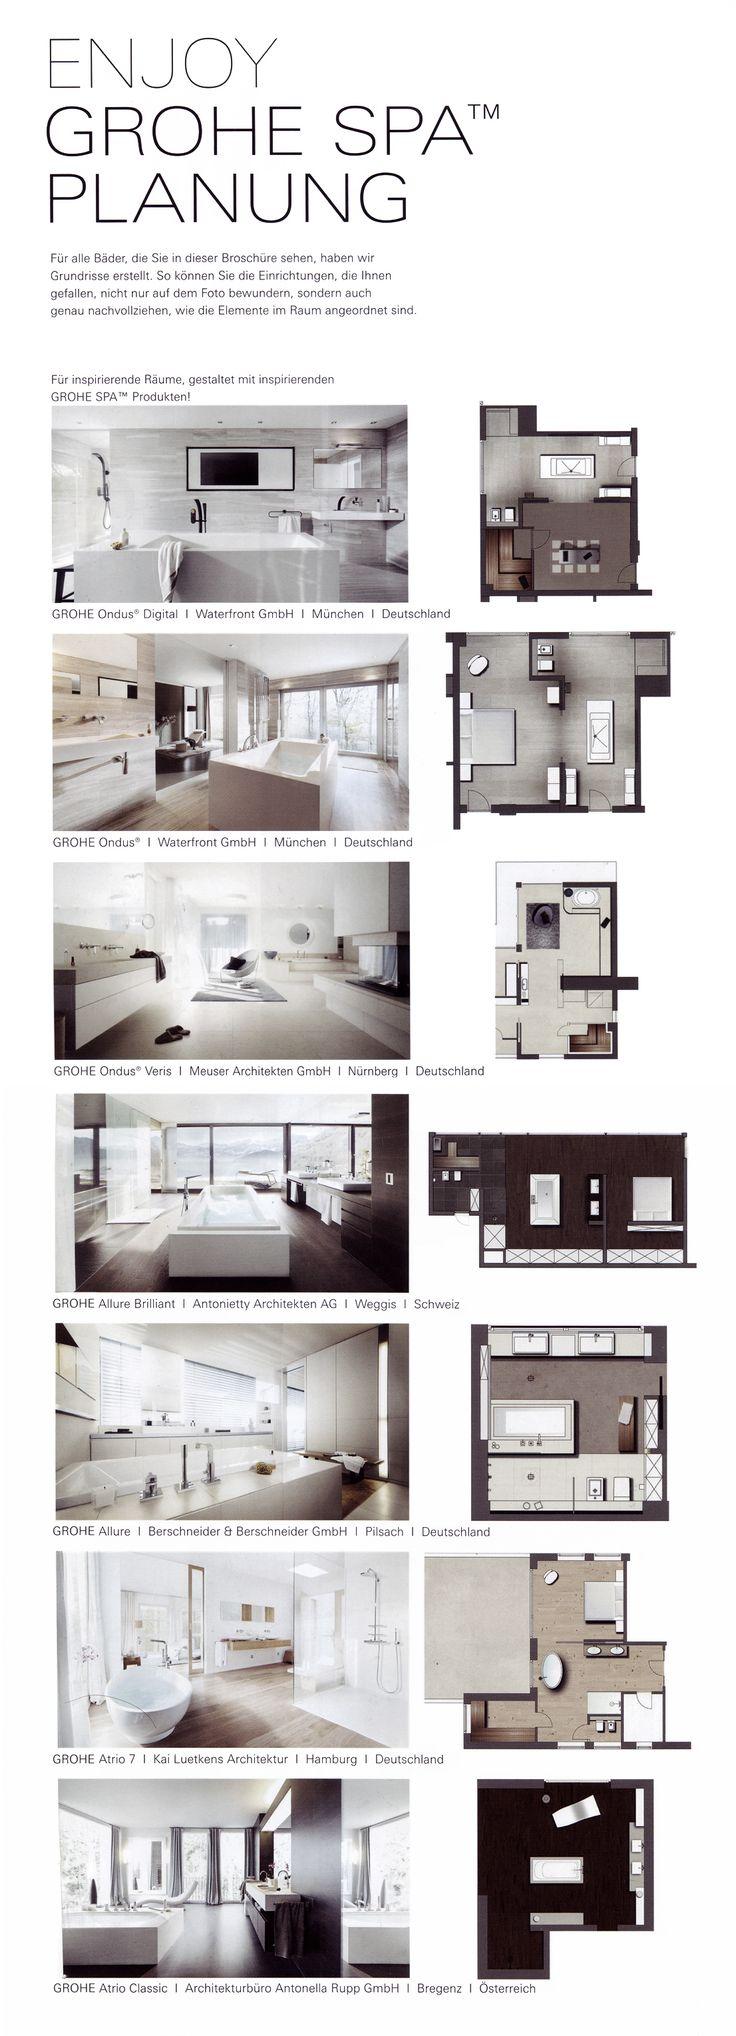 Grohe Spa Planning | Планировки | Планировка | План | Ванные комнаты | Санузлы